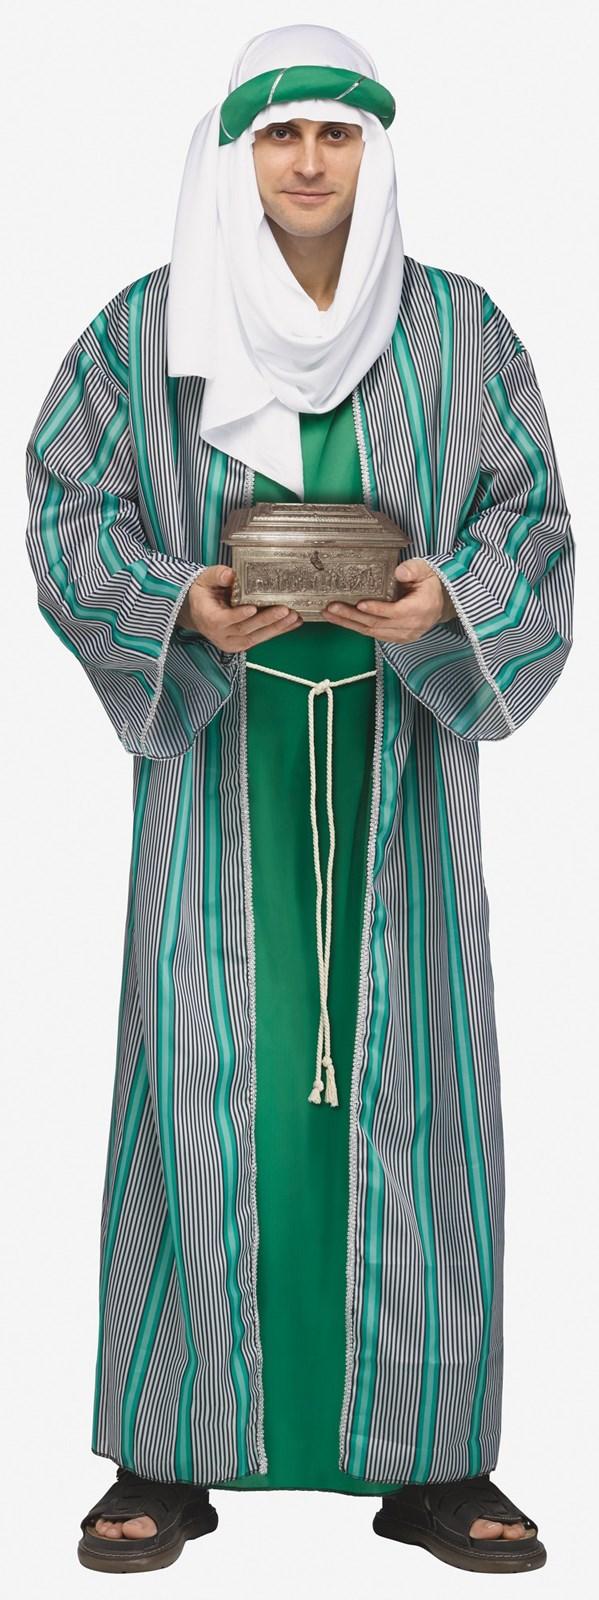 Green wiseman costume for men buycostumes green wiseman costume for men solutioingenieria Gallery